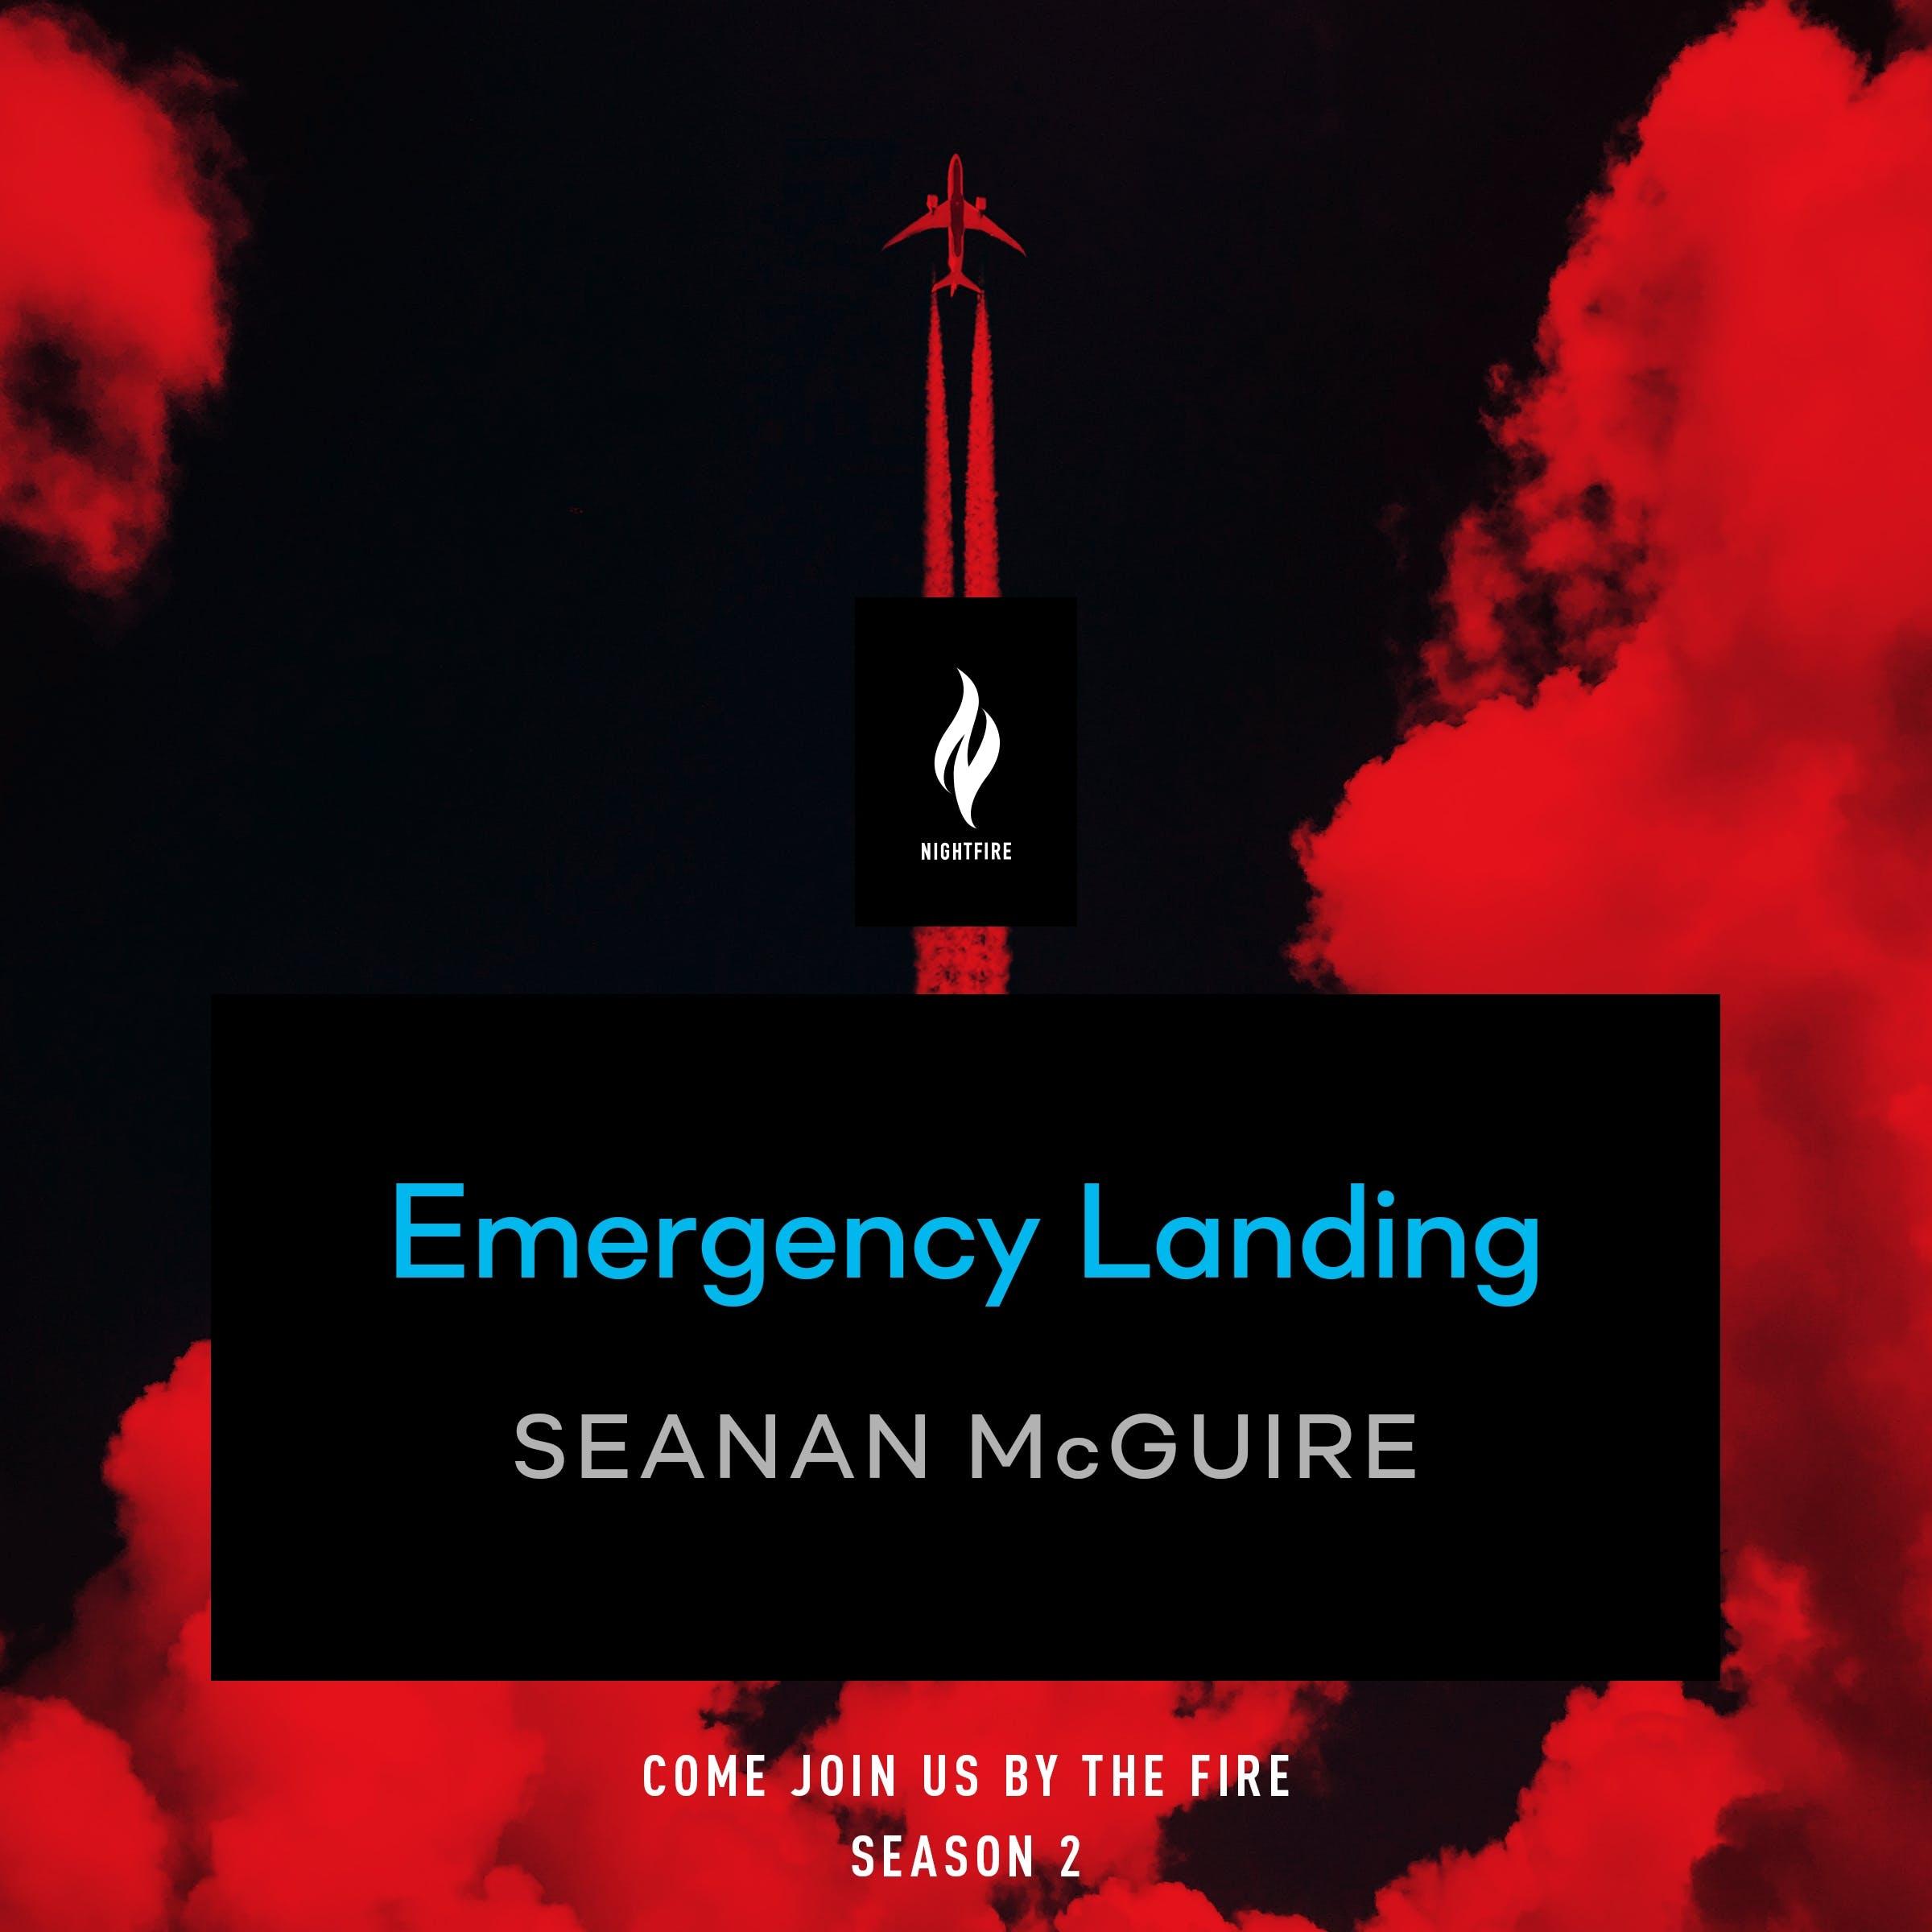 Image of Emergency Landing